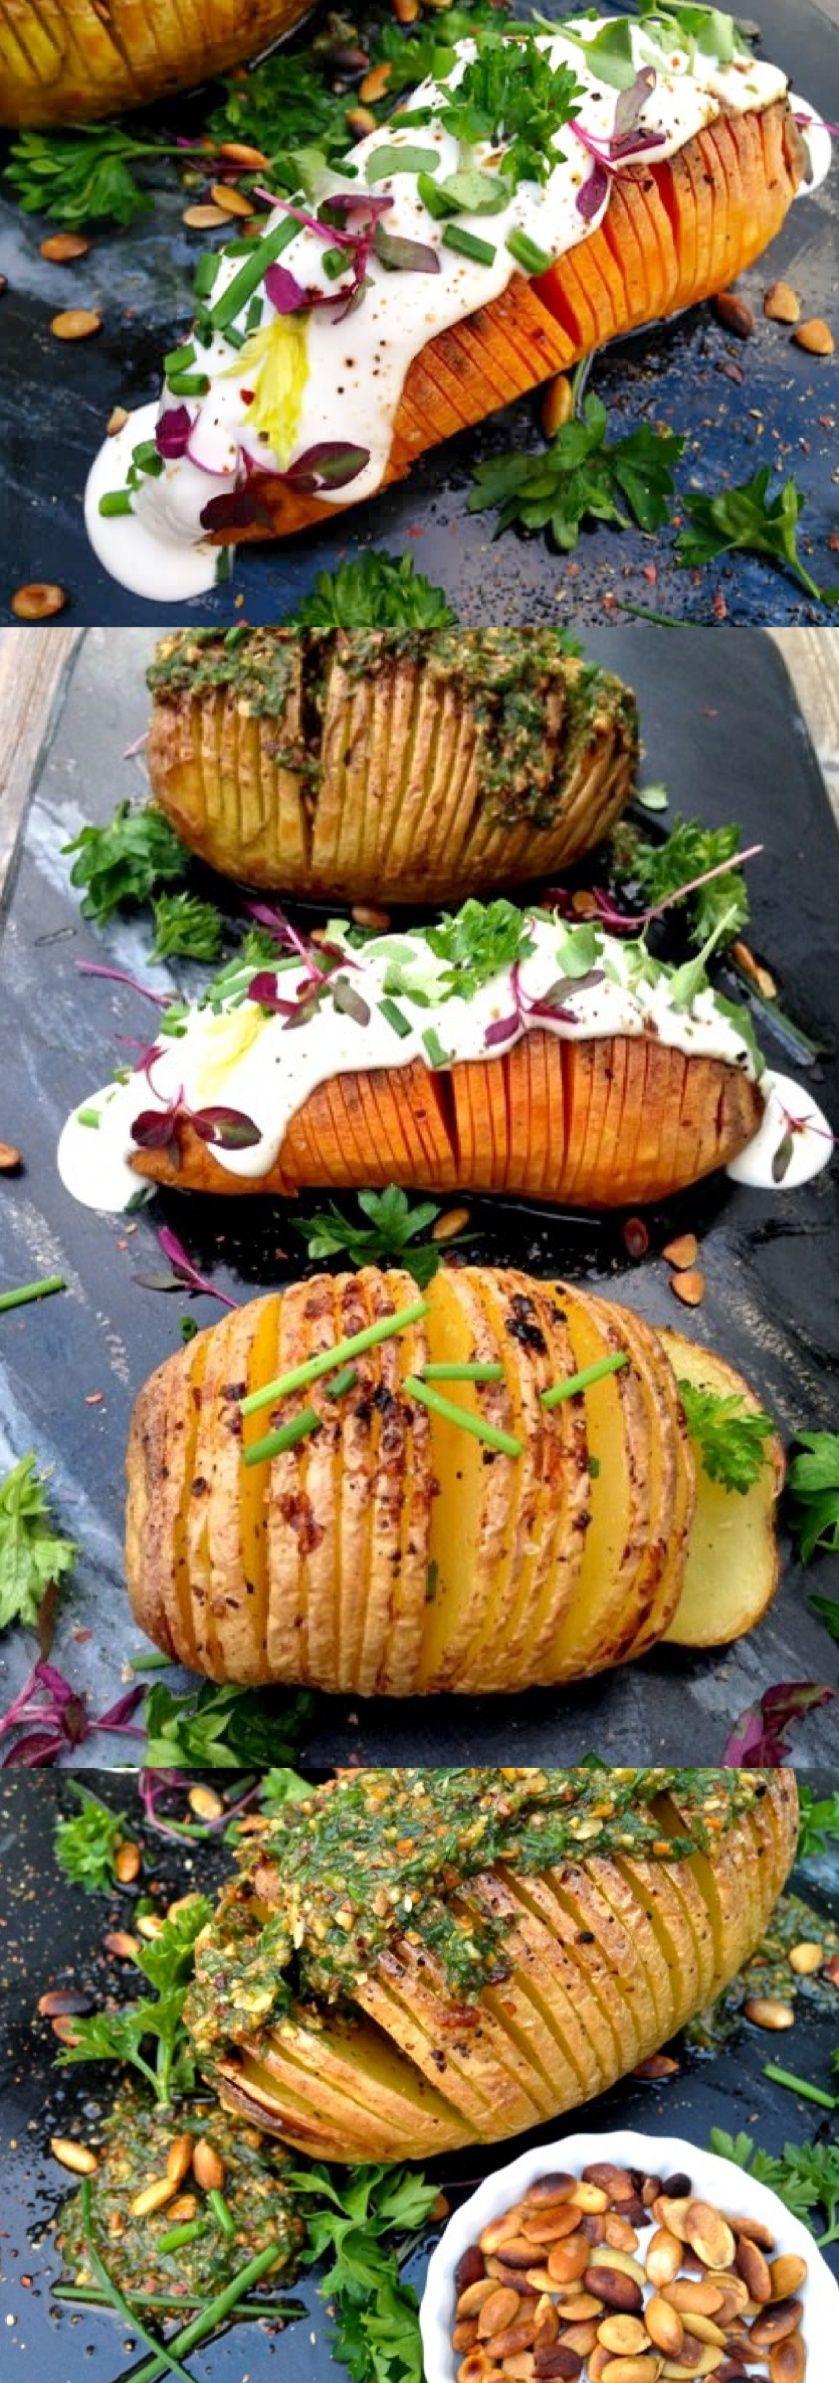 Baked Potato Bar | Rezept | Rezepte, Leckeres essen und ...